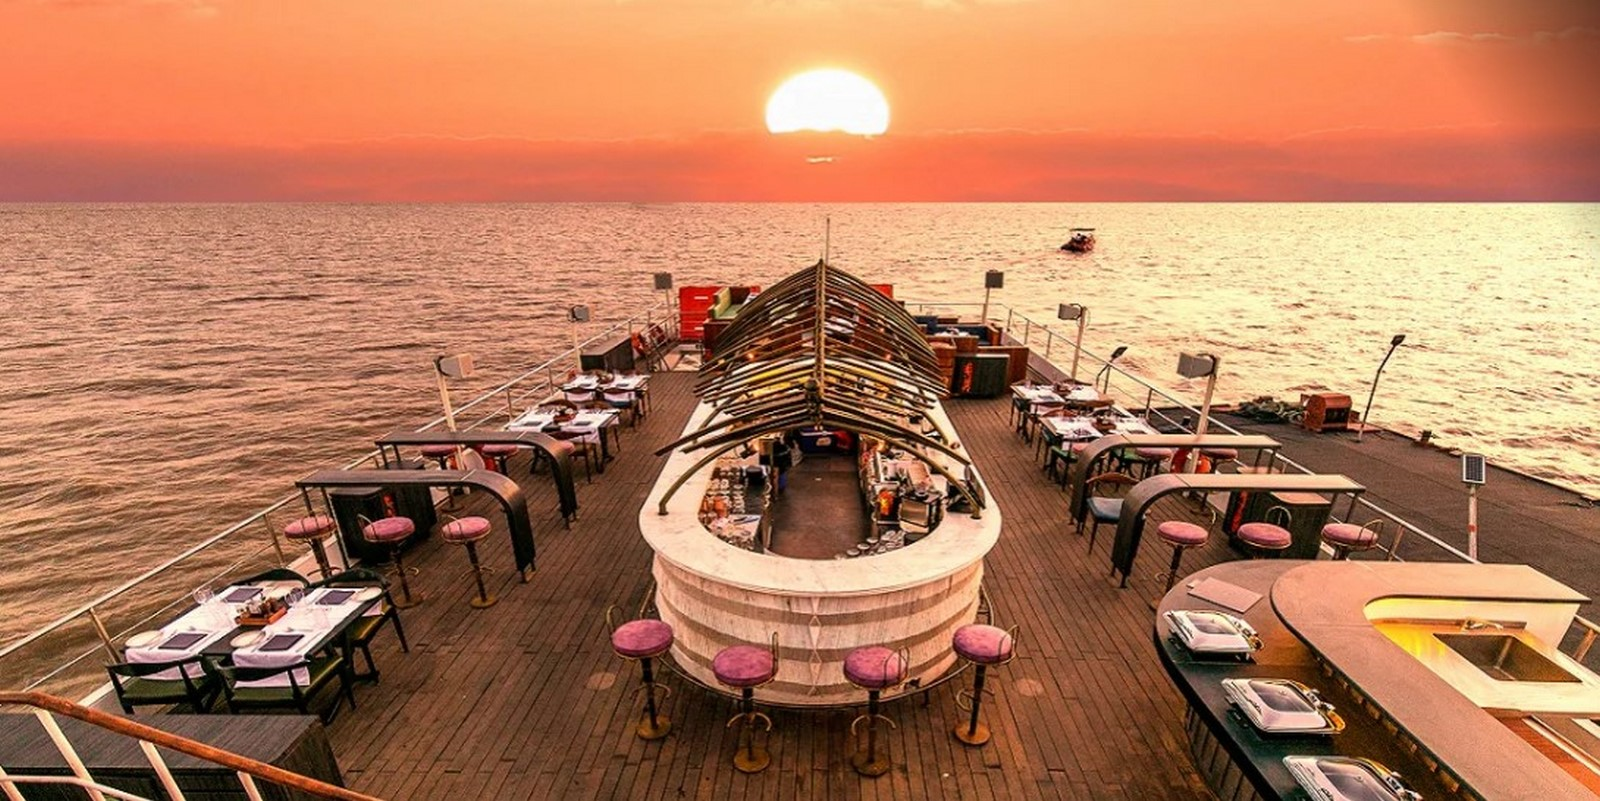 30 Beautiful restaurants in India - Sheet2